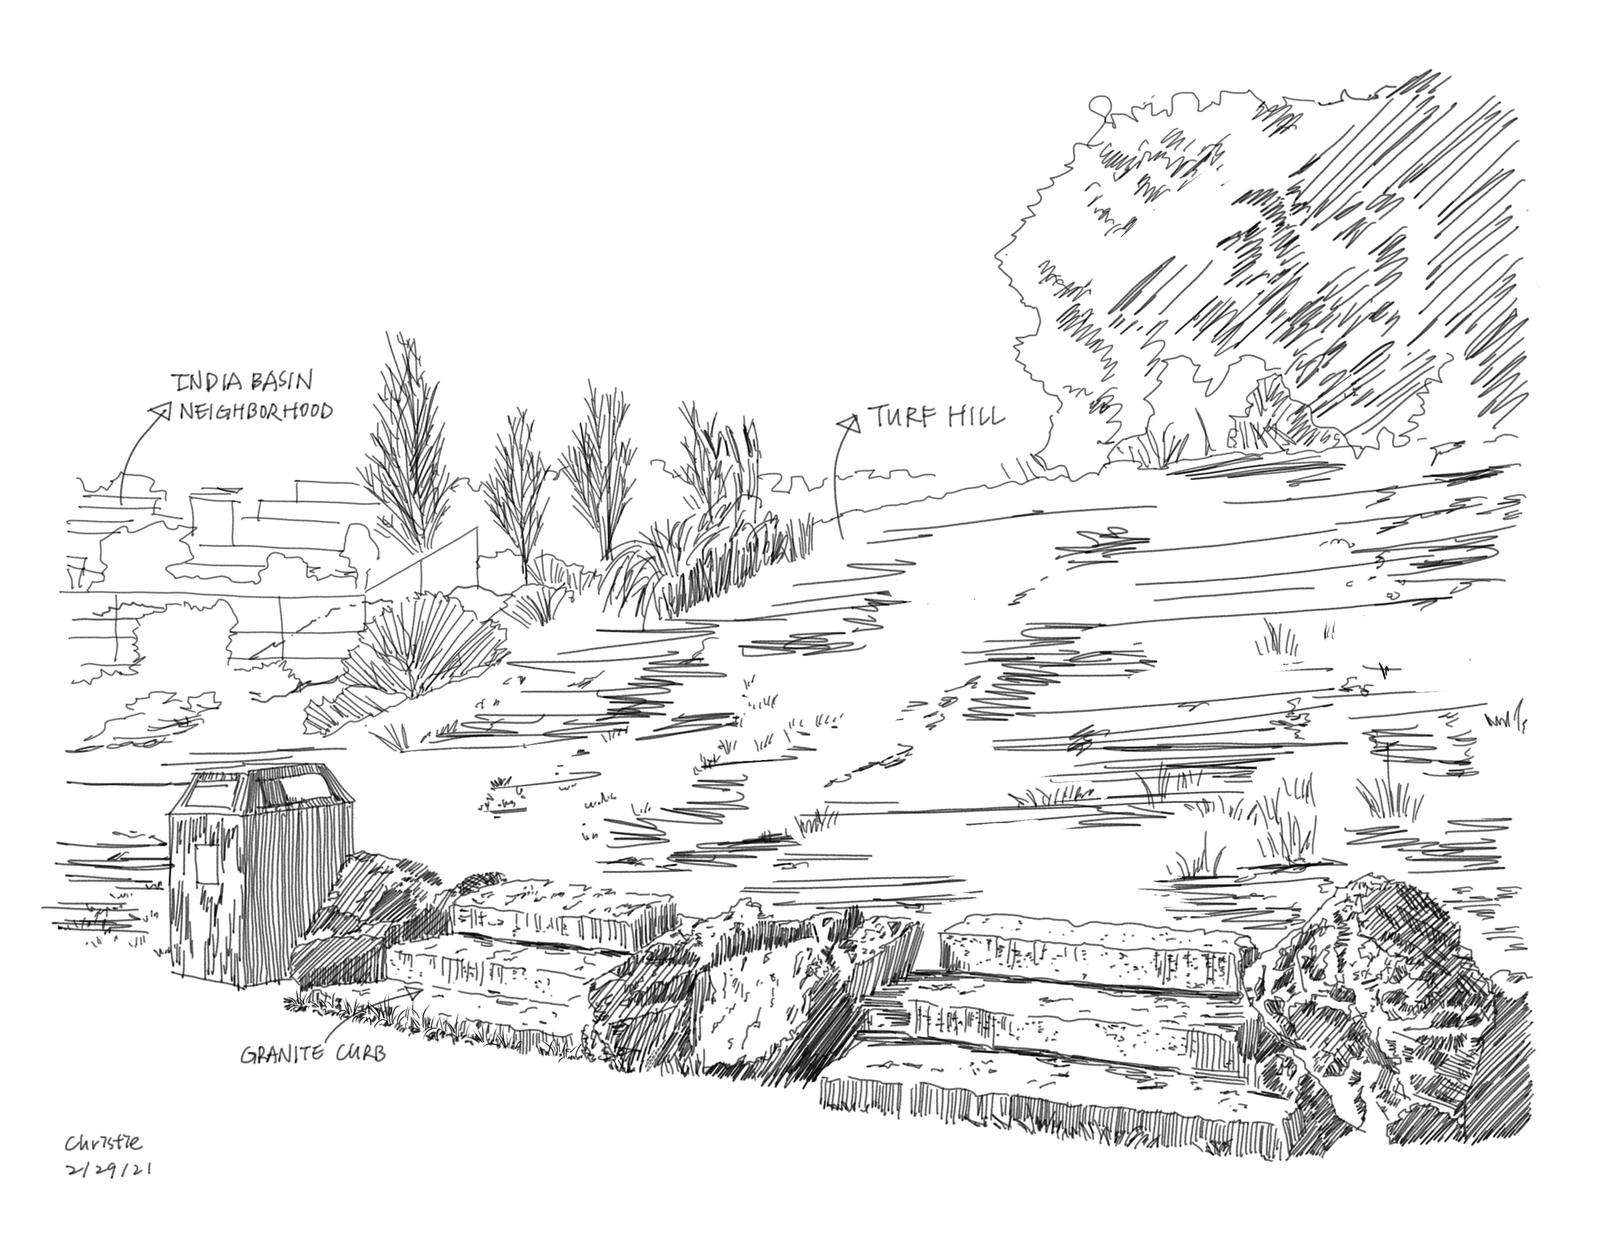 India Basin Park, San Francisco - Site Inventory Sketch 1